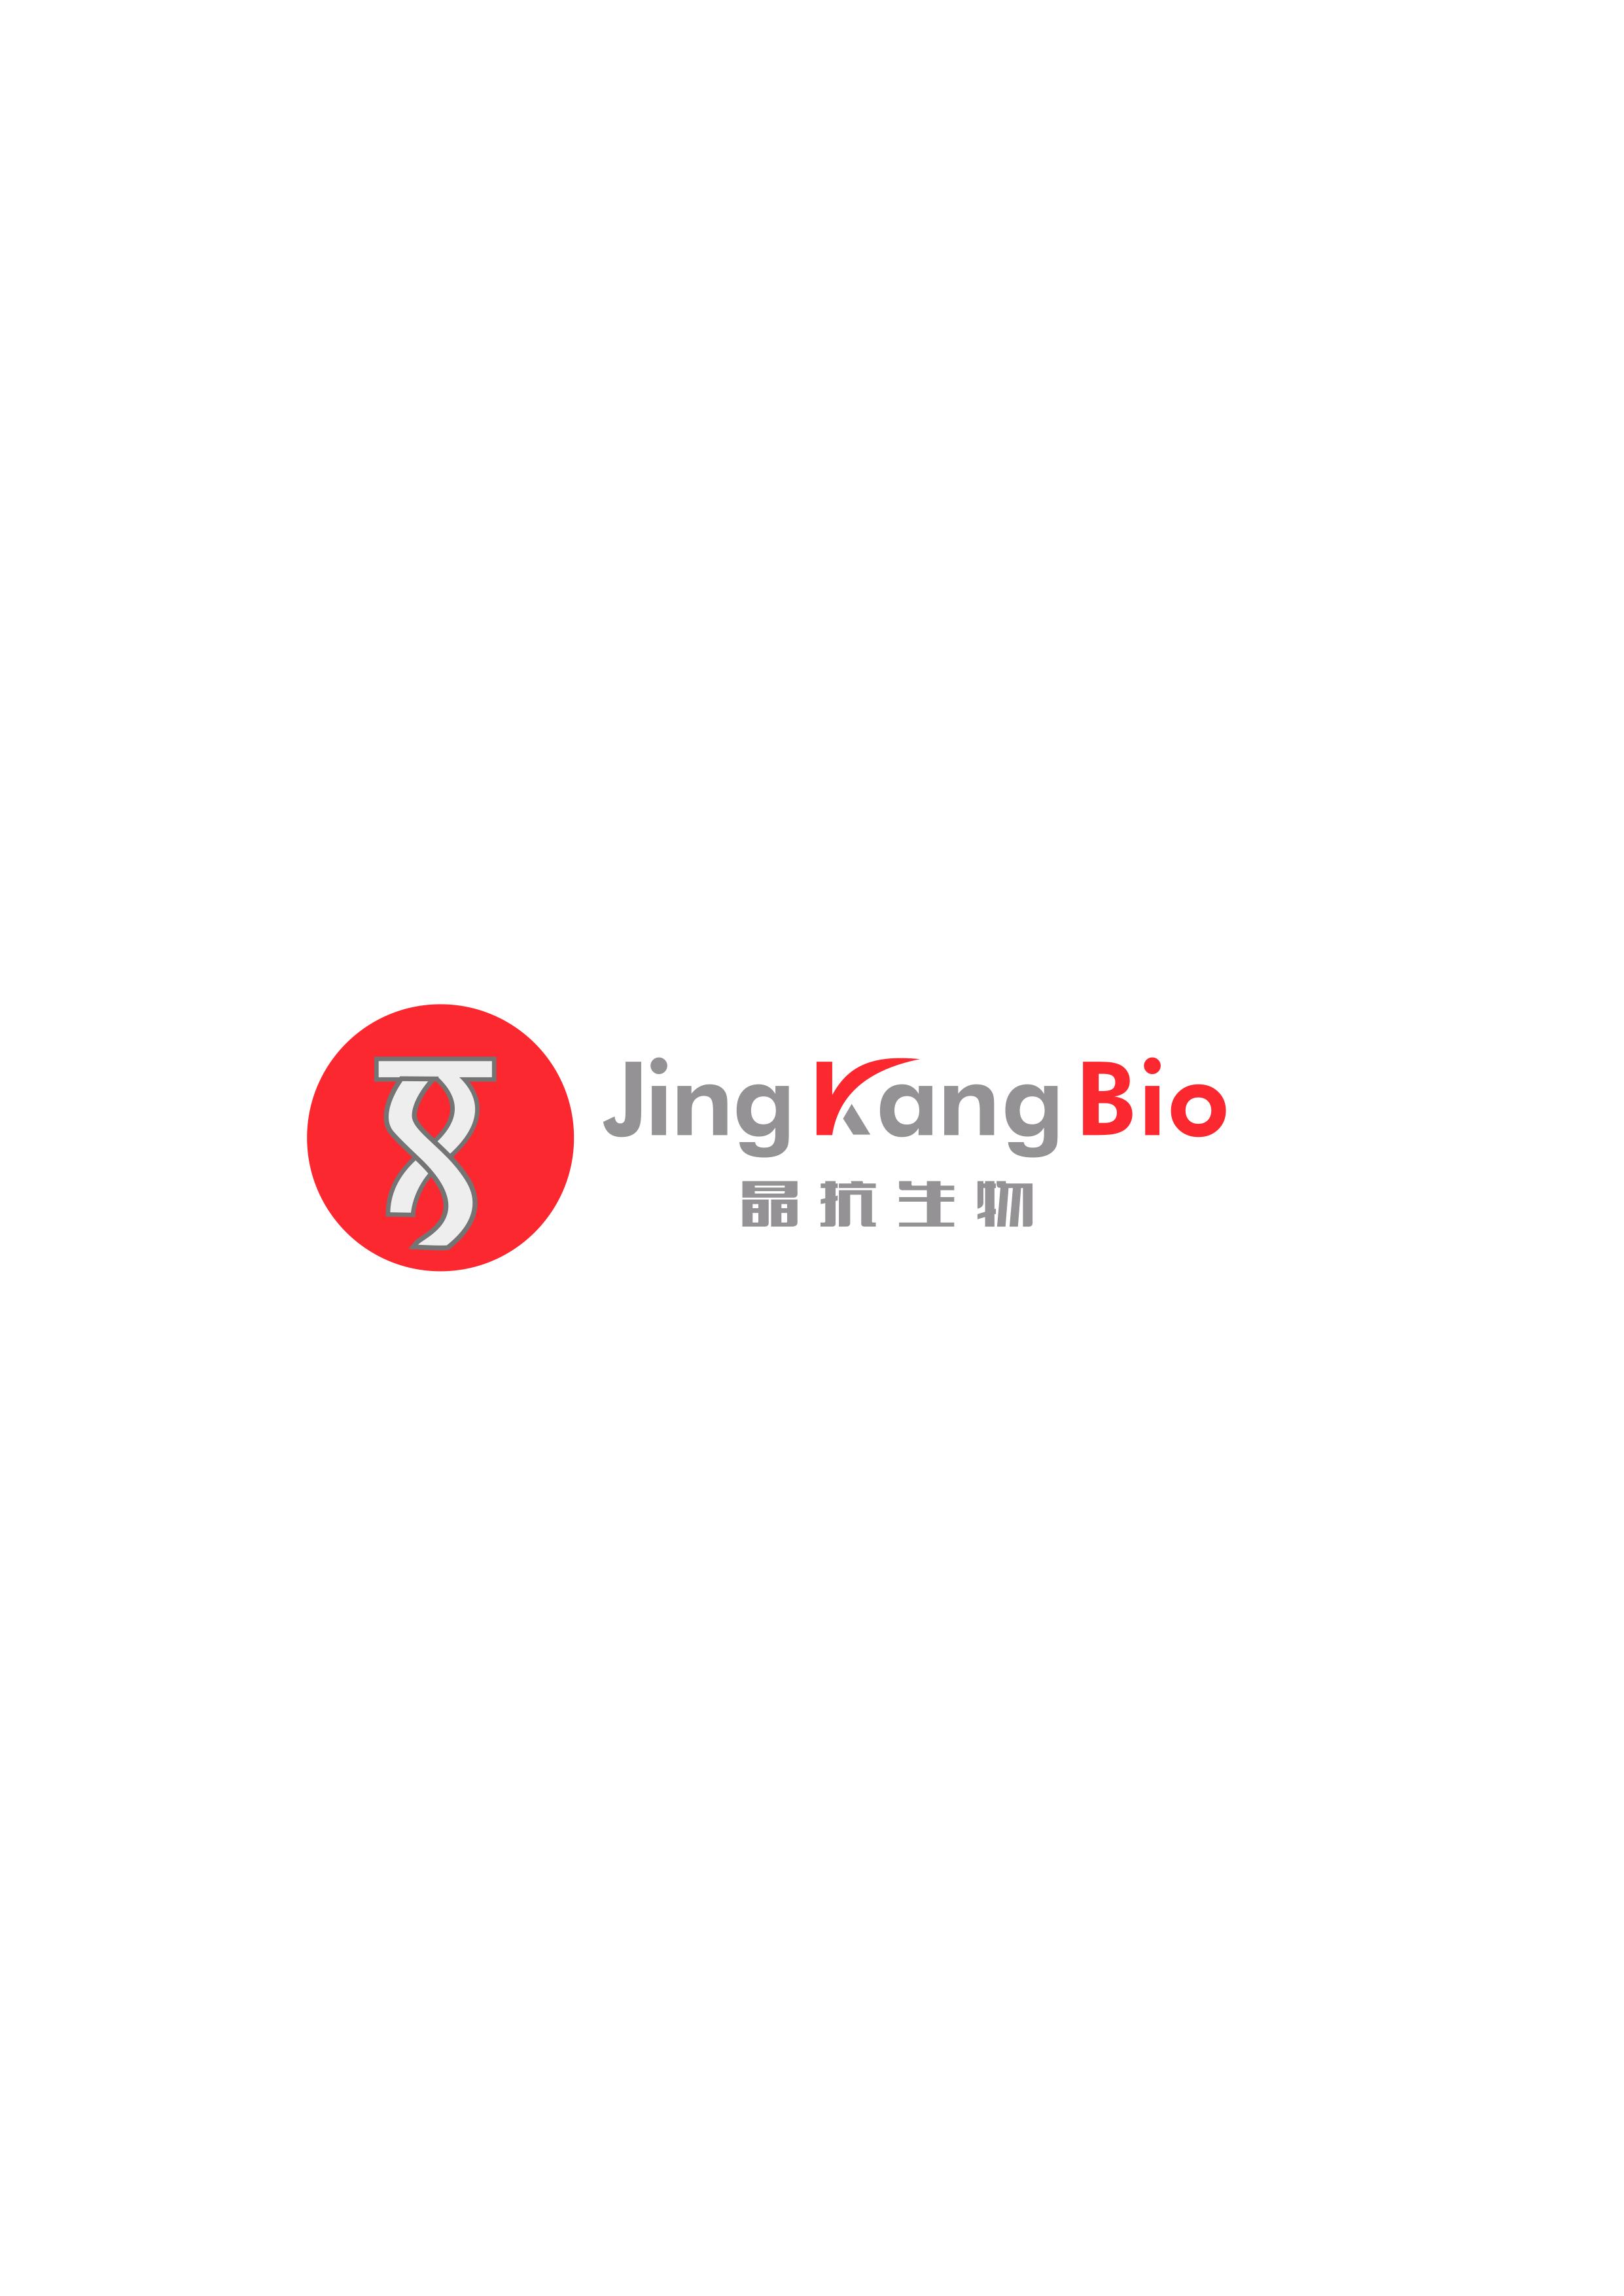 铽/Tb准品,1.0mol/LHNO31.0摩尔/升硝酸);1000µg/ml